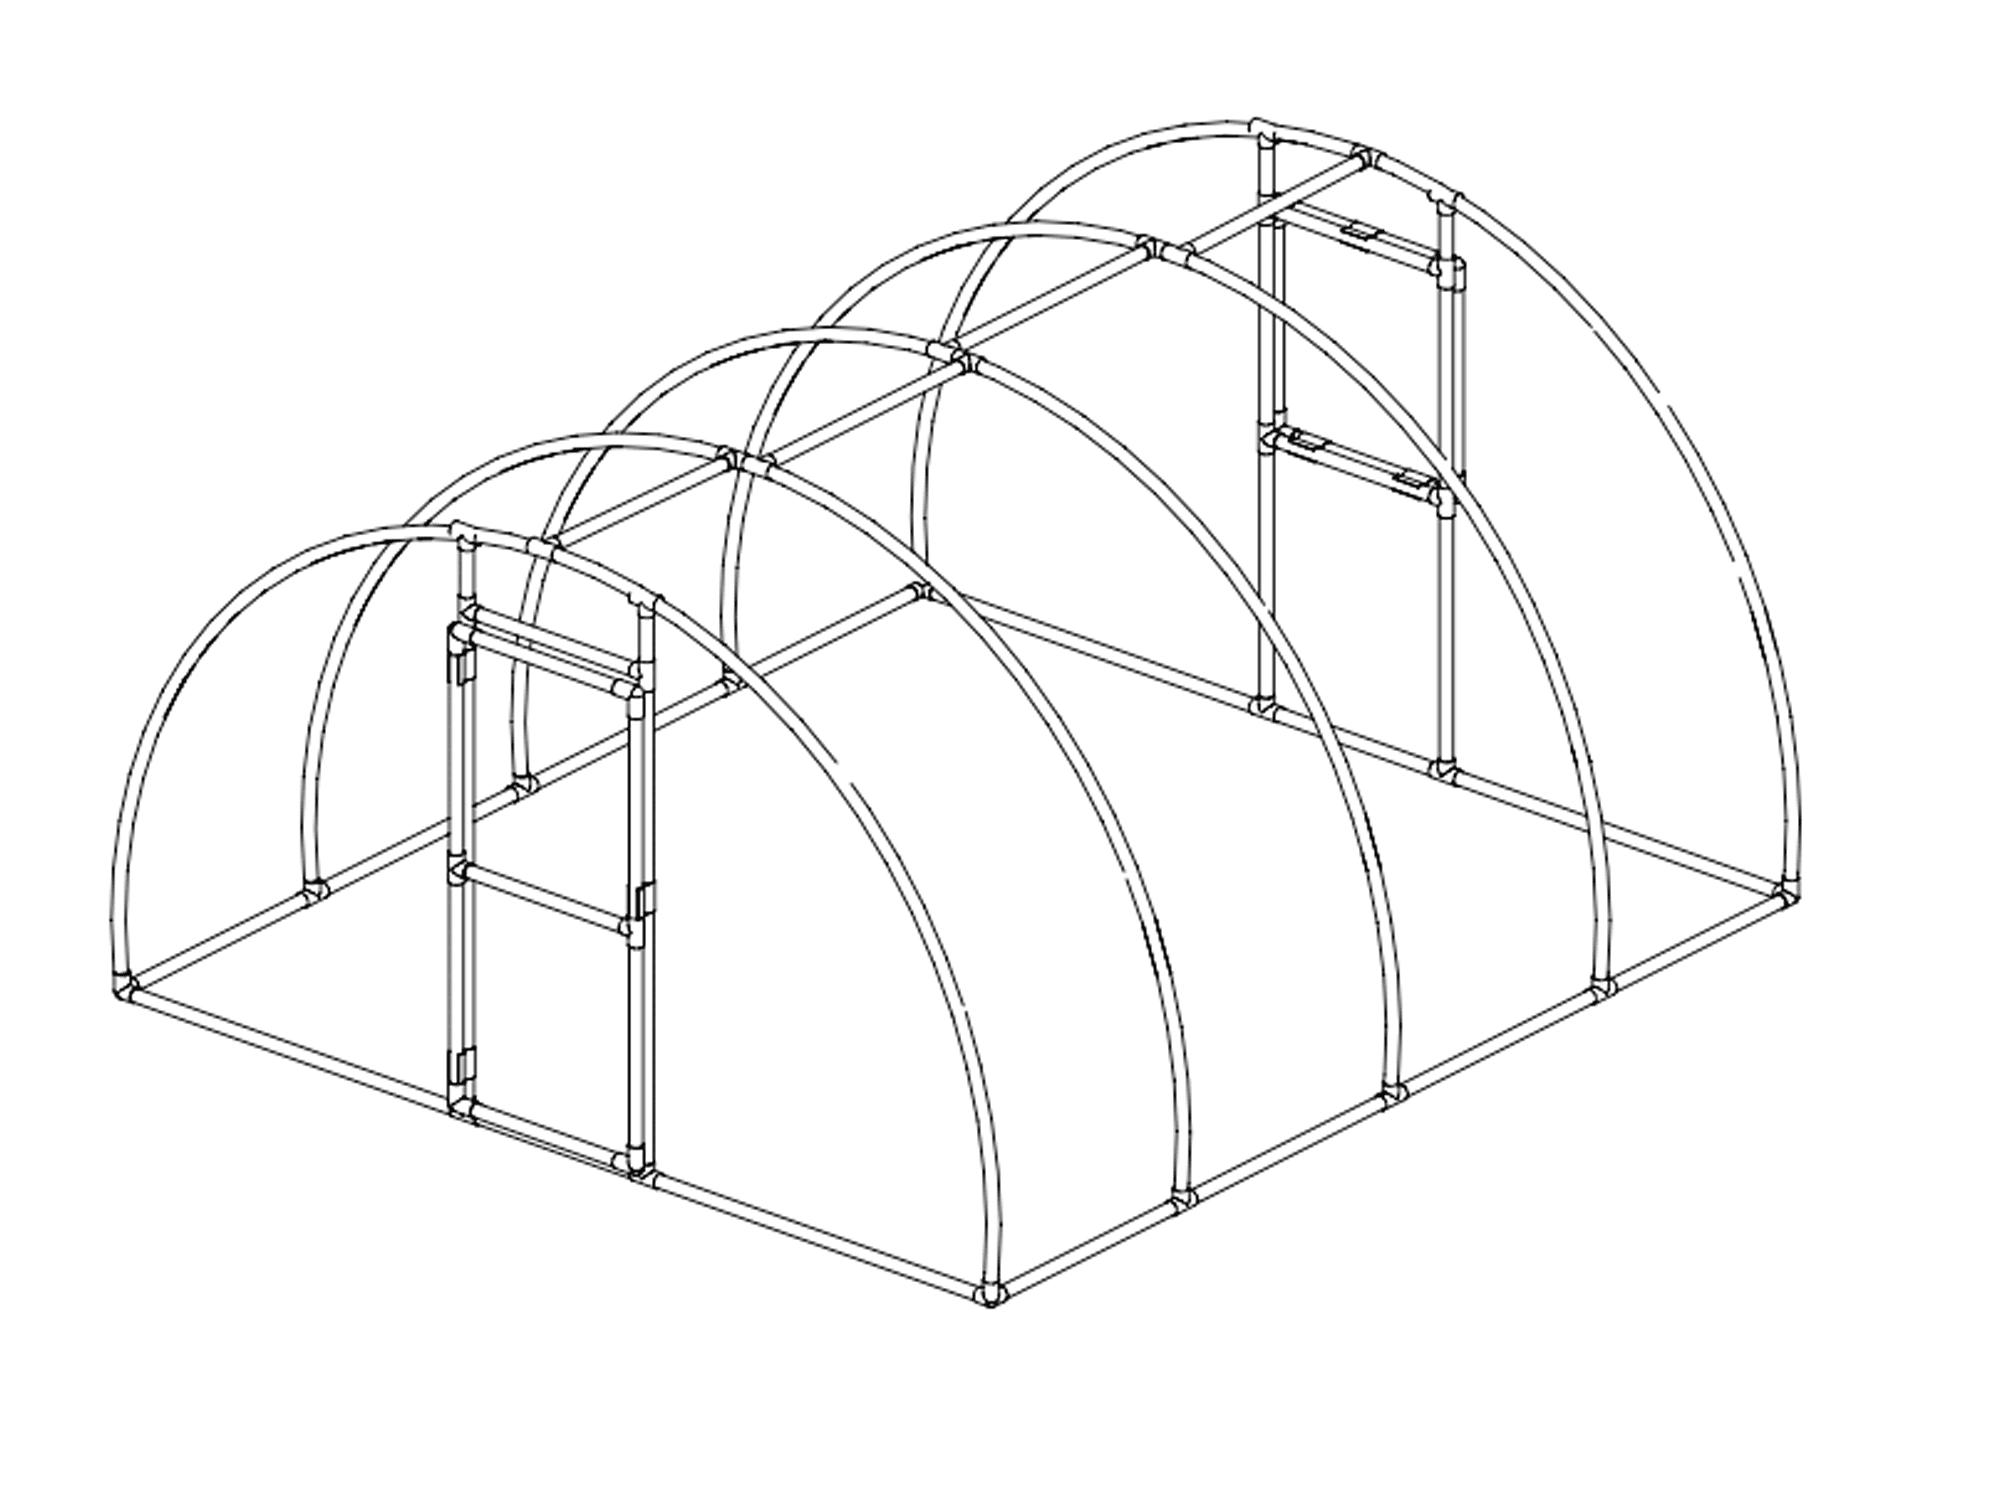 2000x1500 Pvc Hoop House Plans Pdf 11 Free Diy Greenhouse Plans